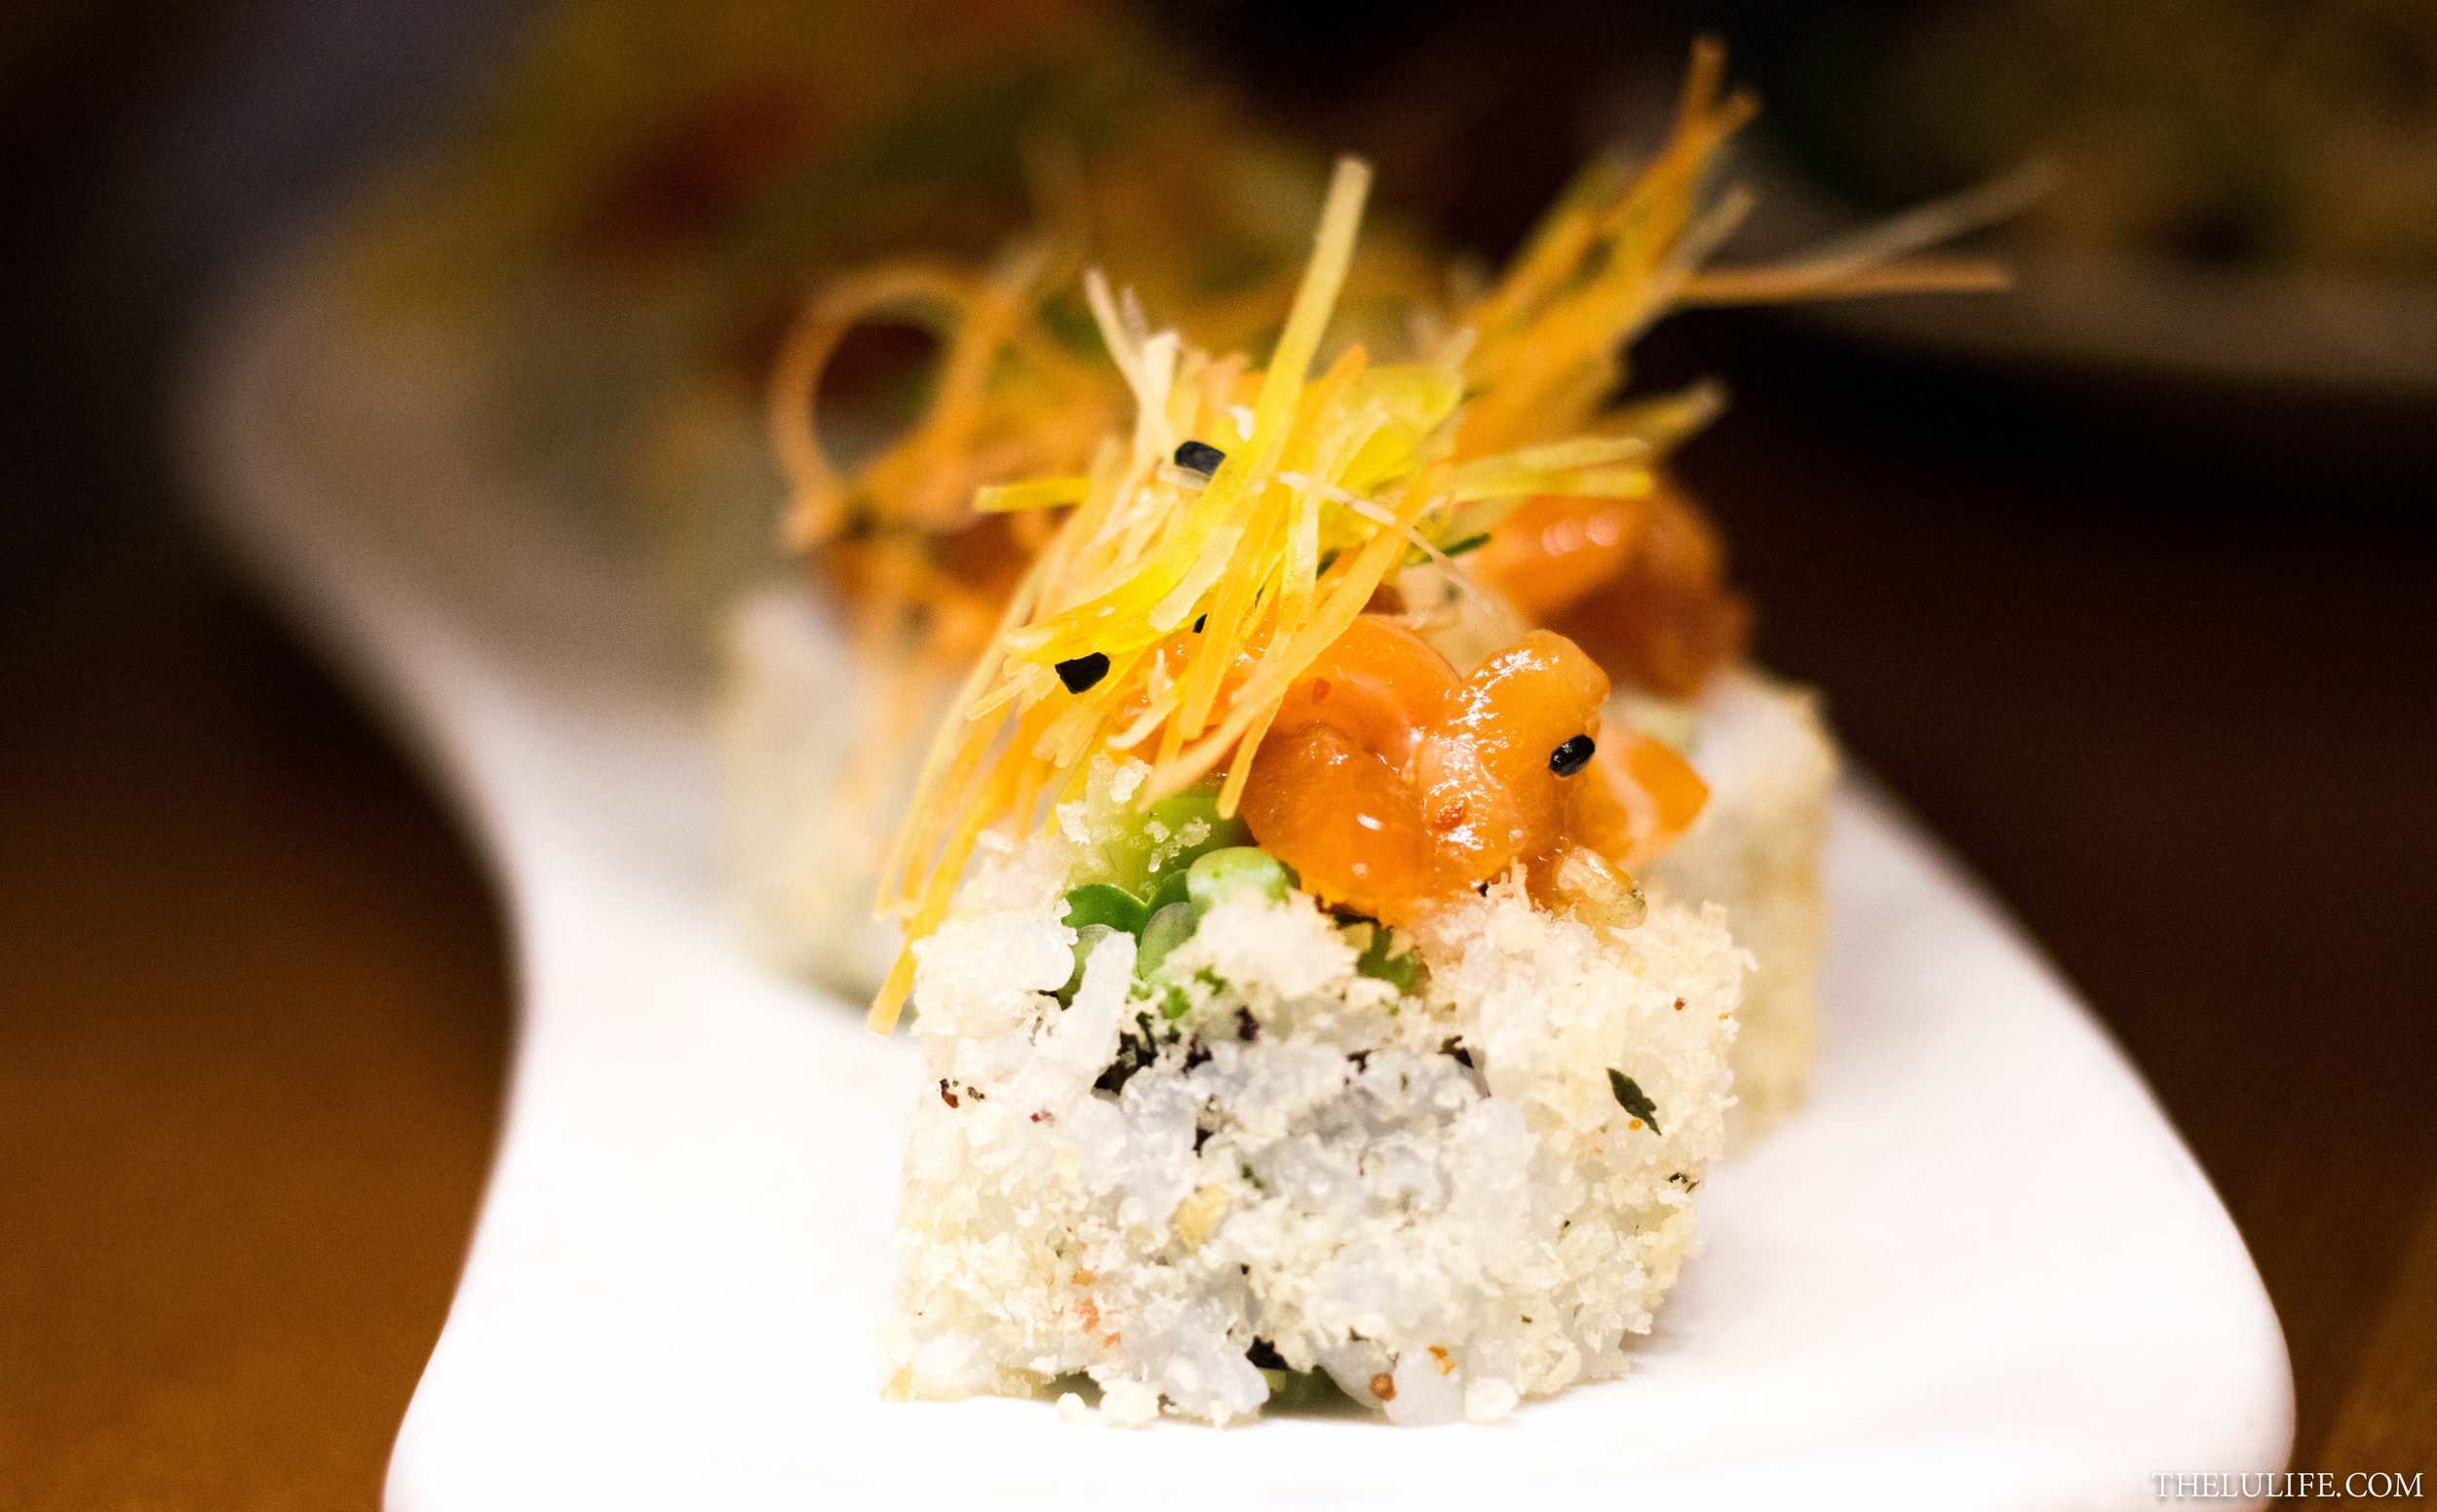 Crispy prawn and chirashi maki